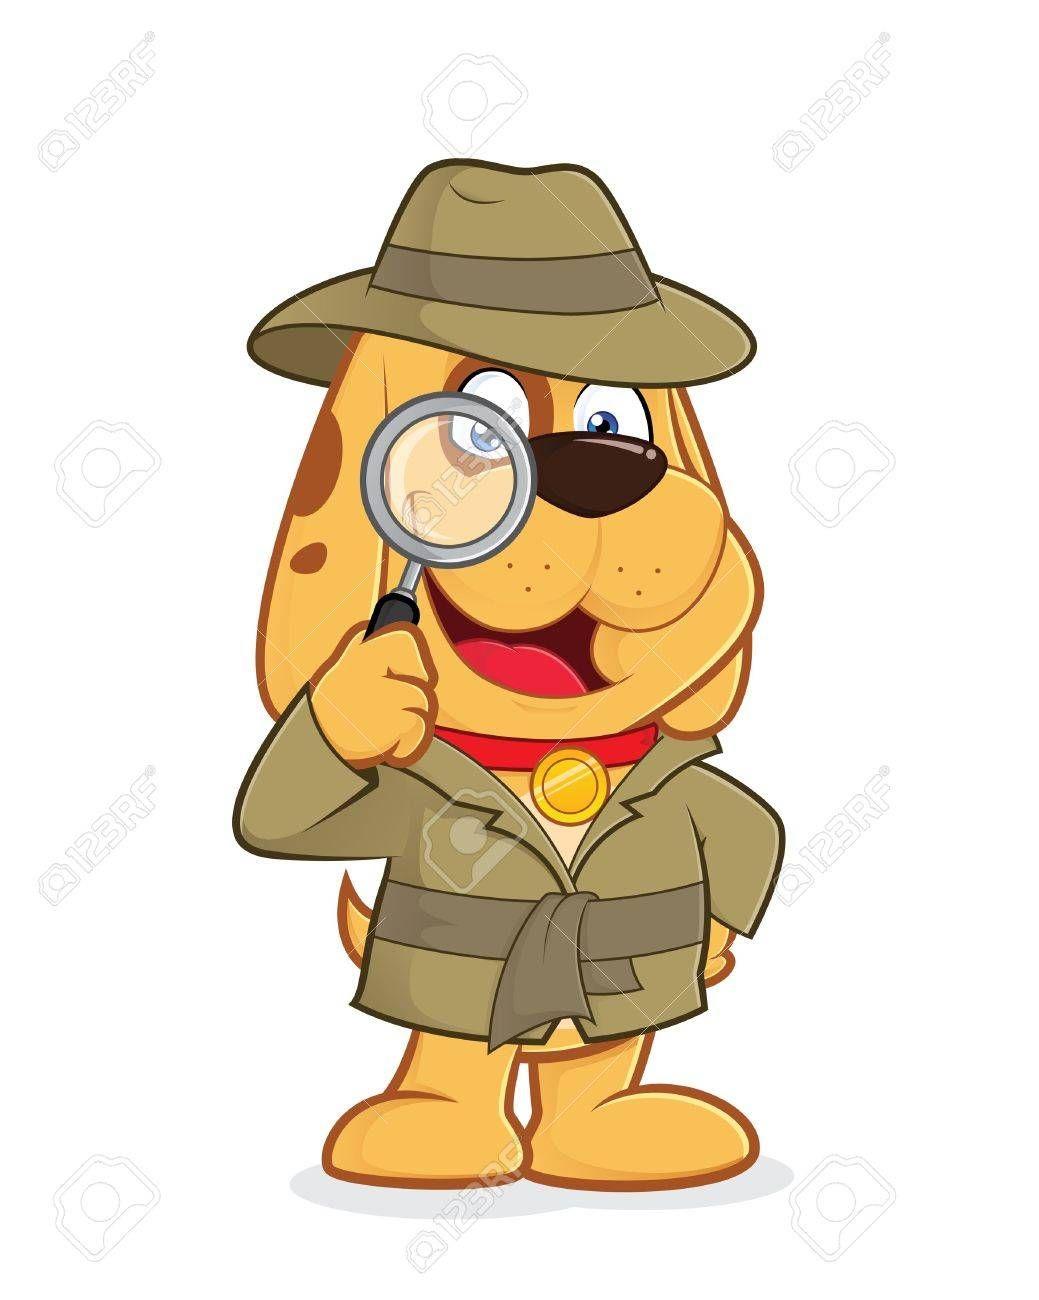 Detective Dog Aff Detective Dog Imagenes Animadas Detective Cuento Policial